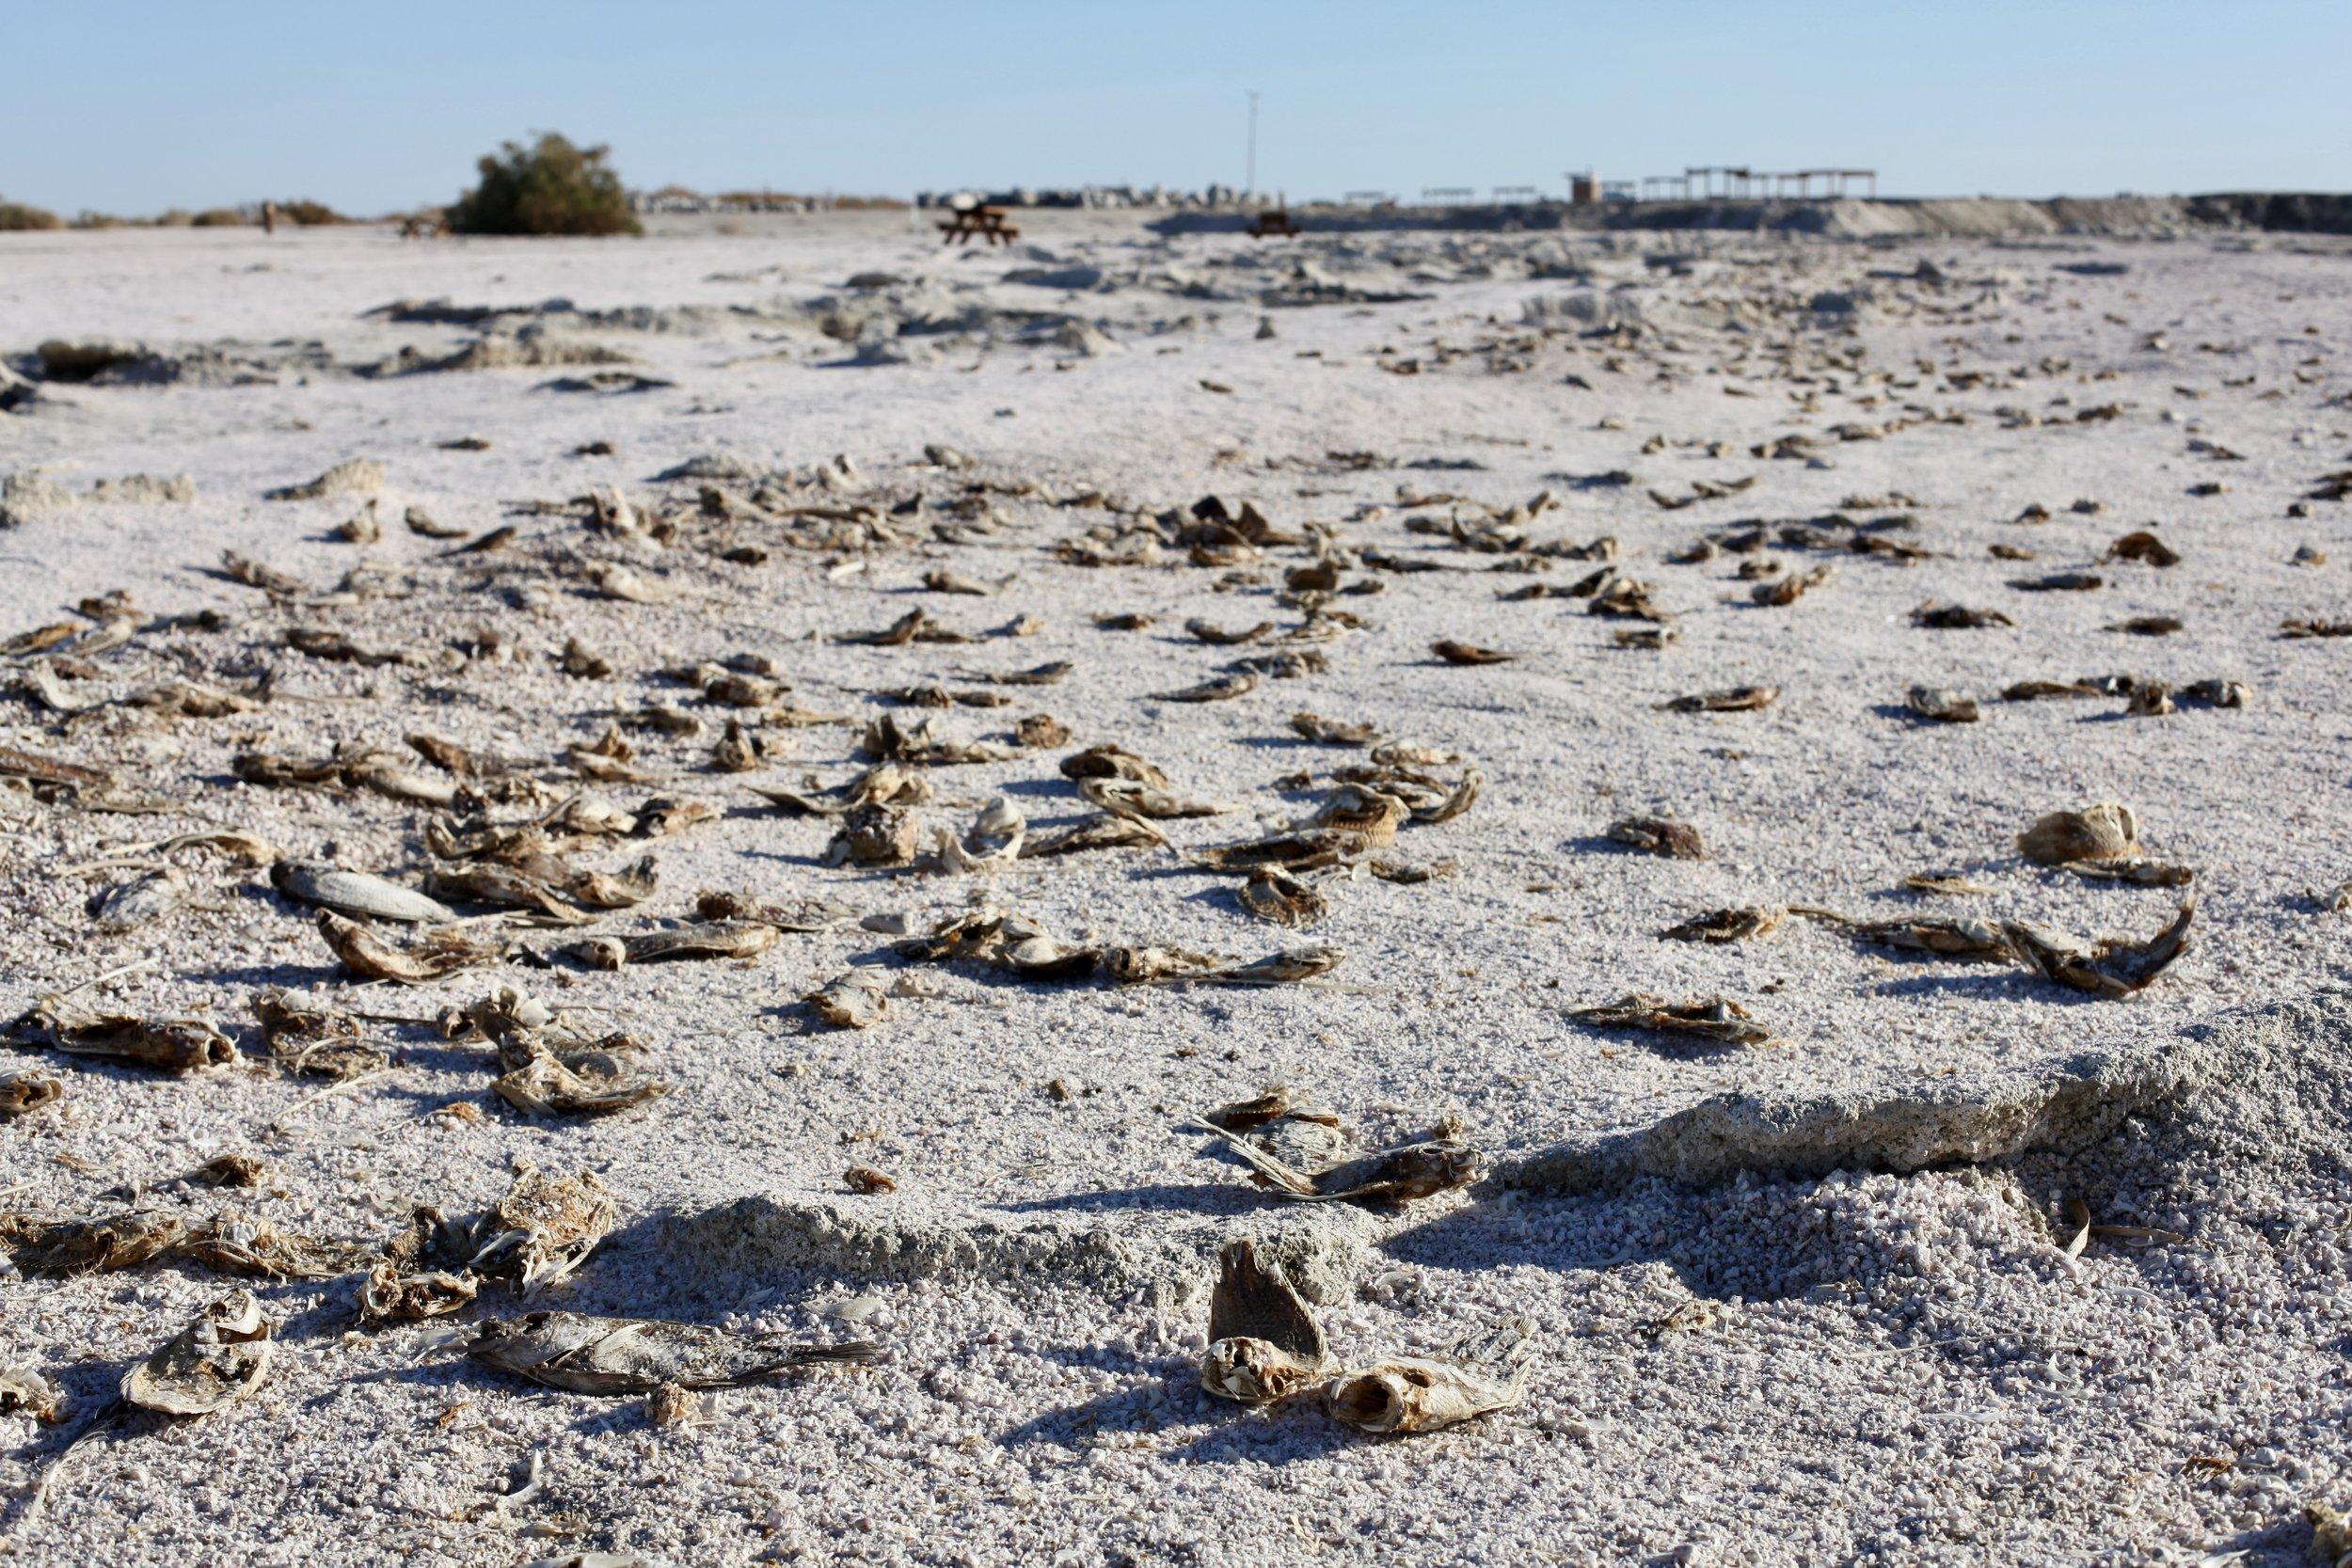 Hundreds of dead tilapia carcasses litter Mecca Beach on the Salton Sea's eastern shore on Jan. 6, 2017.(Photo by Ethan Jakob Craft.)